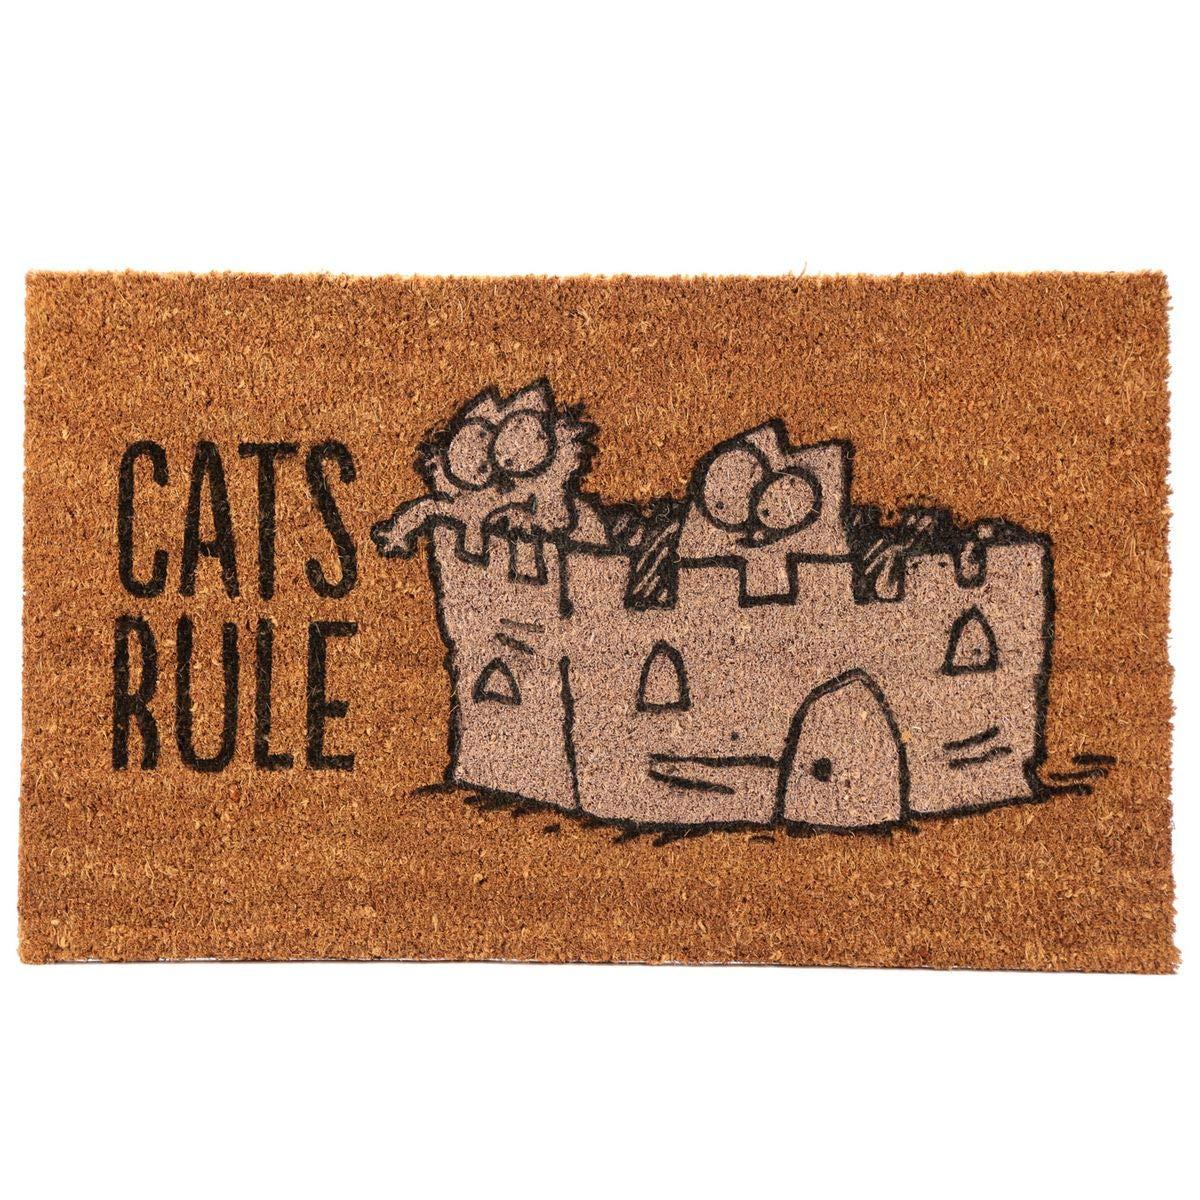 Simon's Cat - Fußmatte aus Kokosfaser